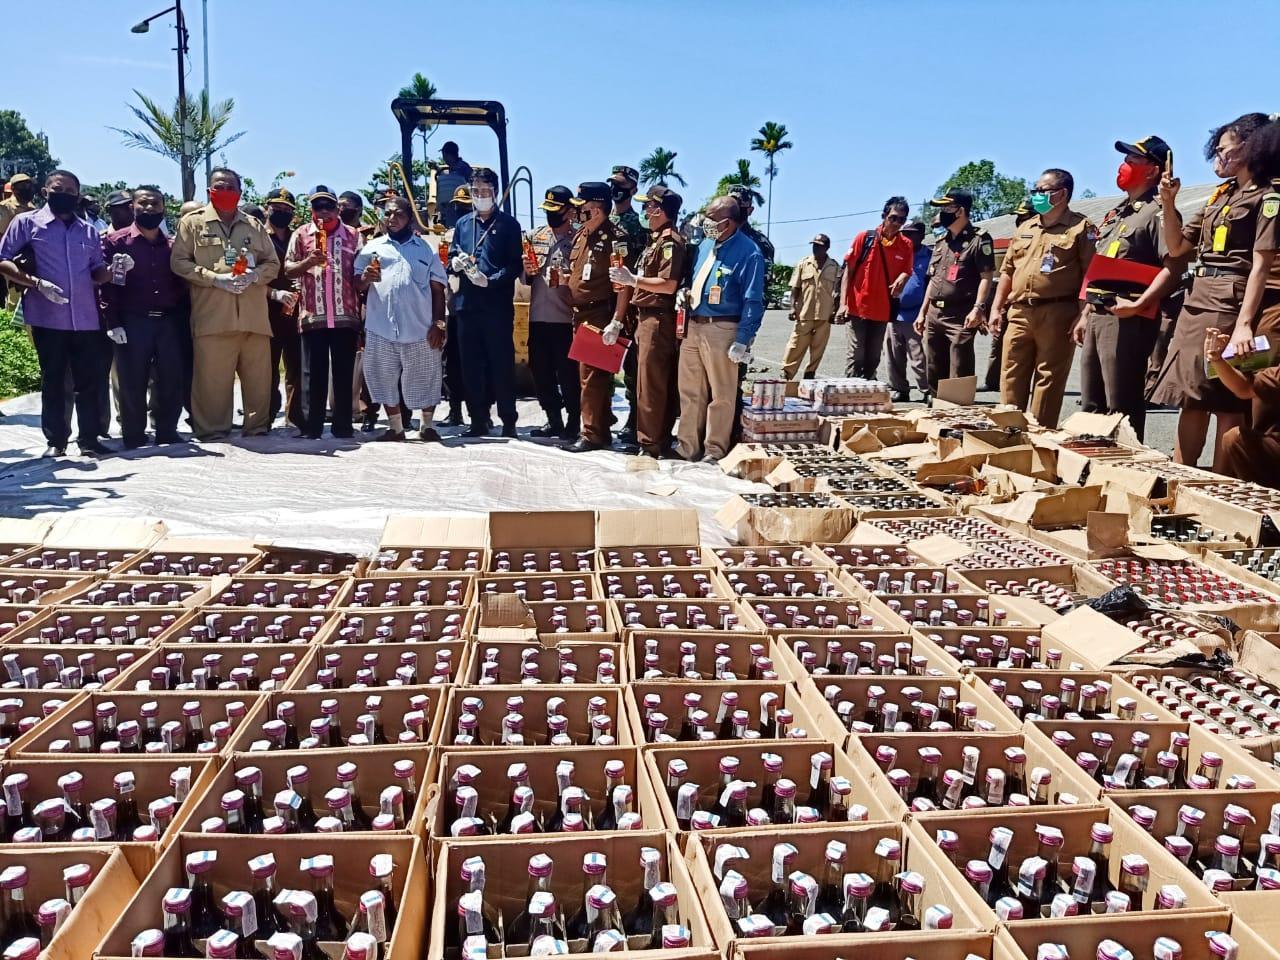 Kejati Papua Barat Musnahkan 4.041 Botol Miras Dan Belasan Bungkus Ganja 1 IMG 20200720 WA0038